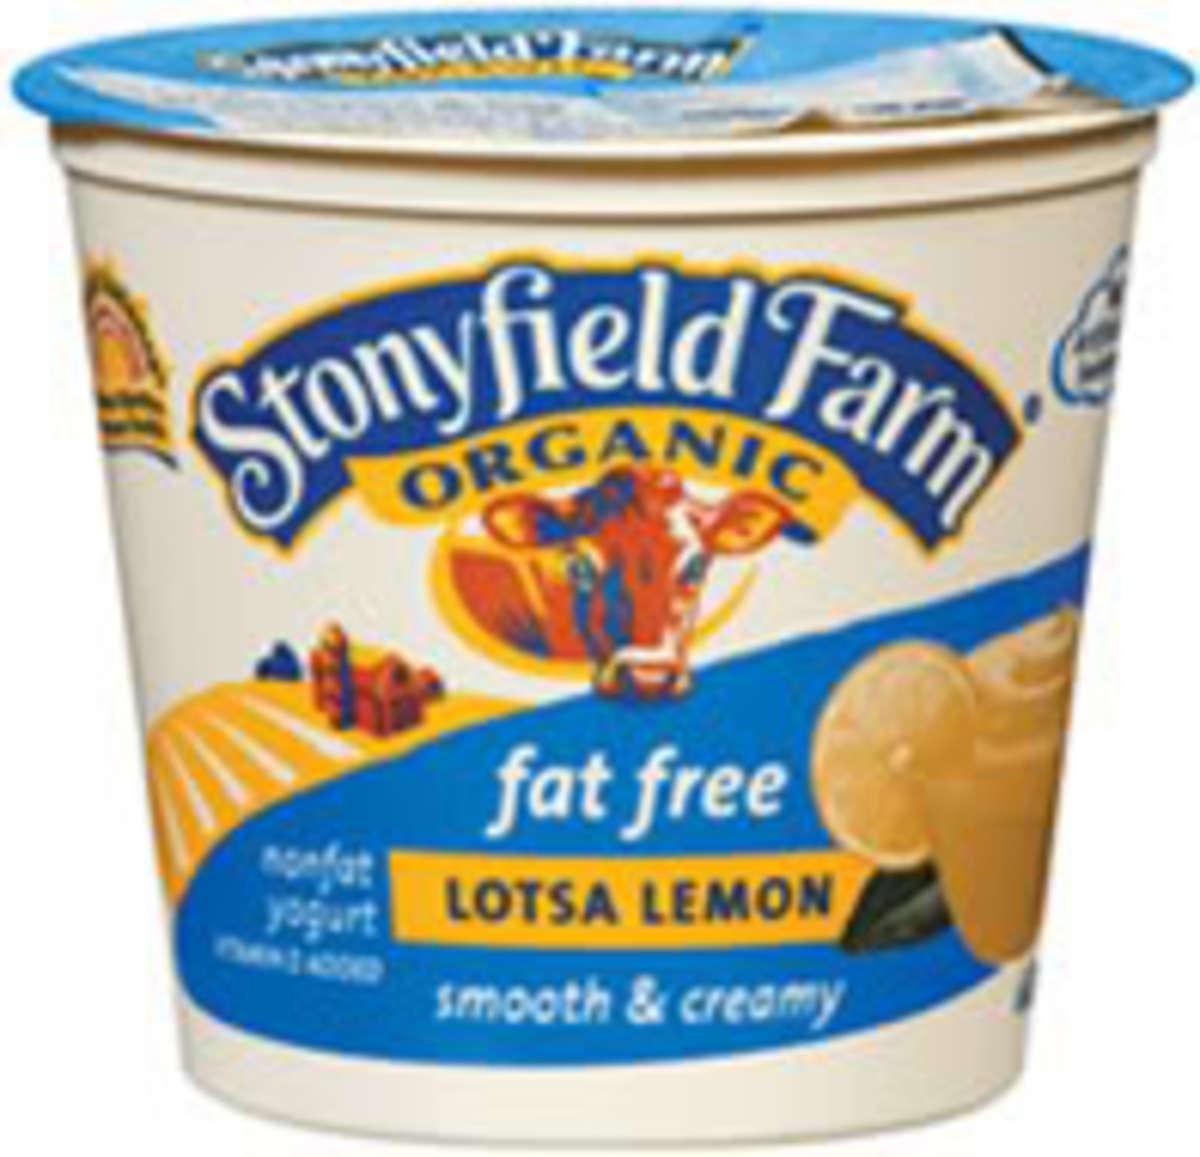 stonyfieldyogurt1